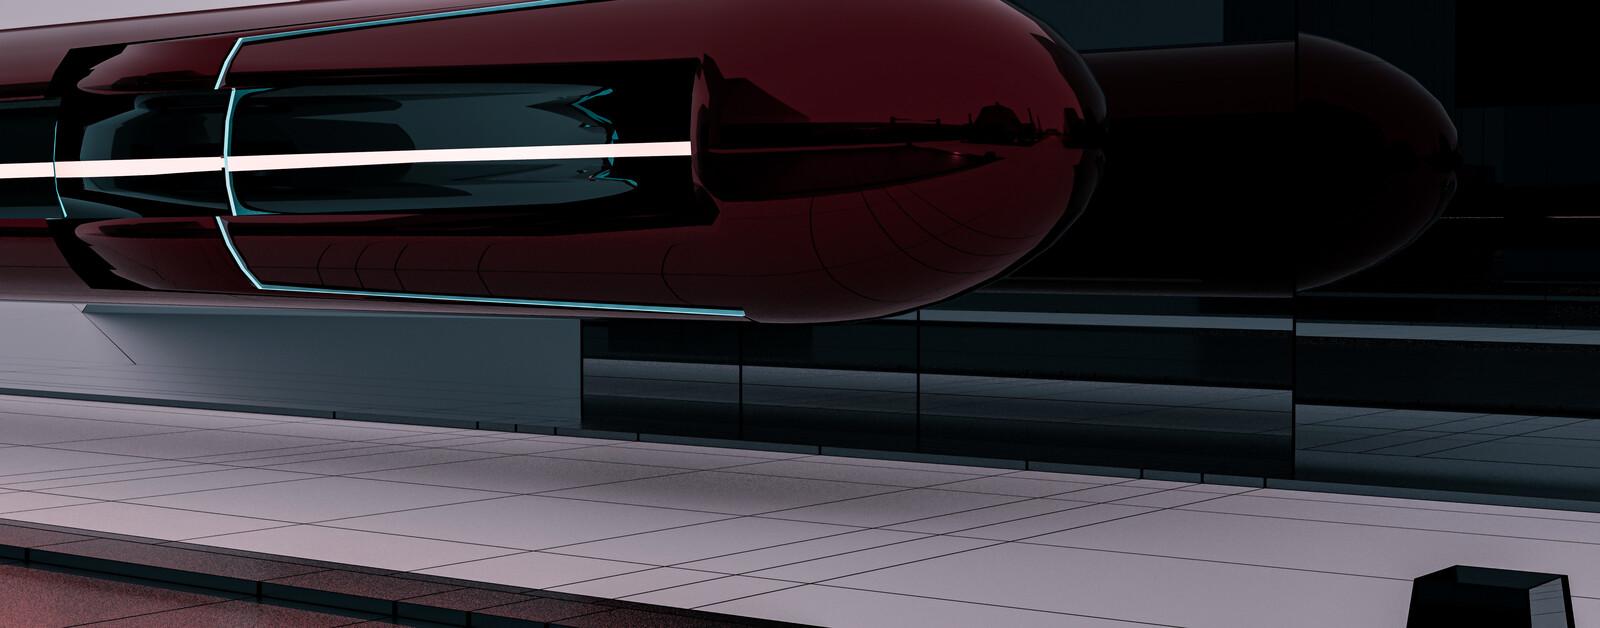 SciFi HyperPlane Hoovercraft Quantum Electrodynamics Electromagnetic levitation Electric AirJet